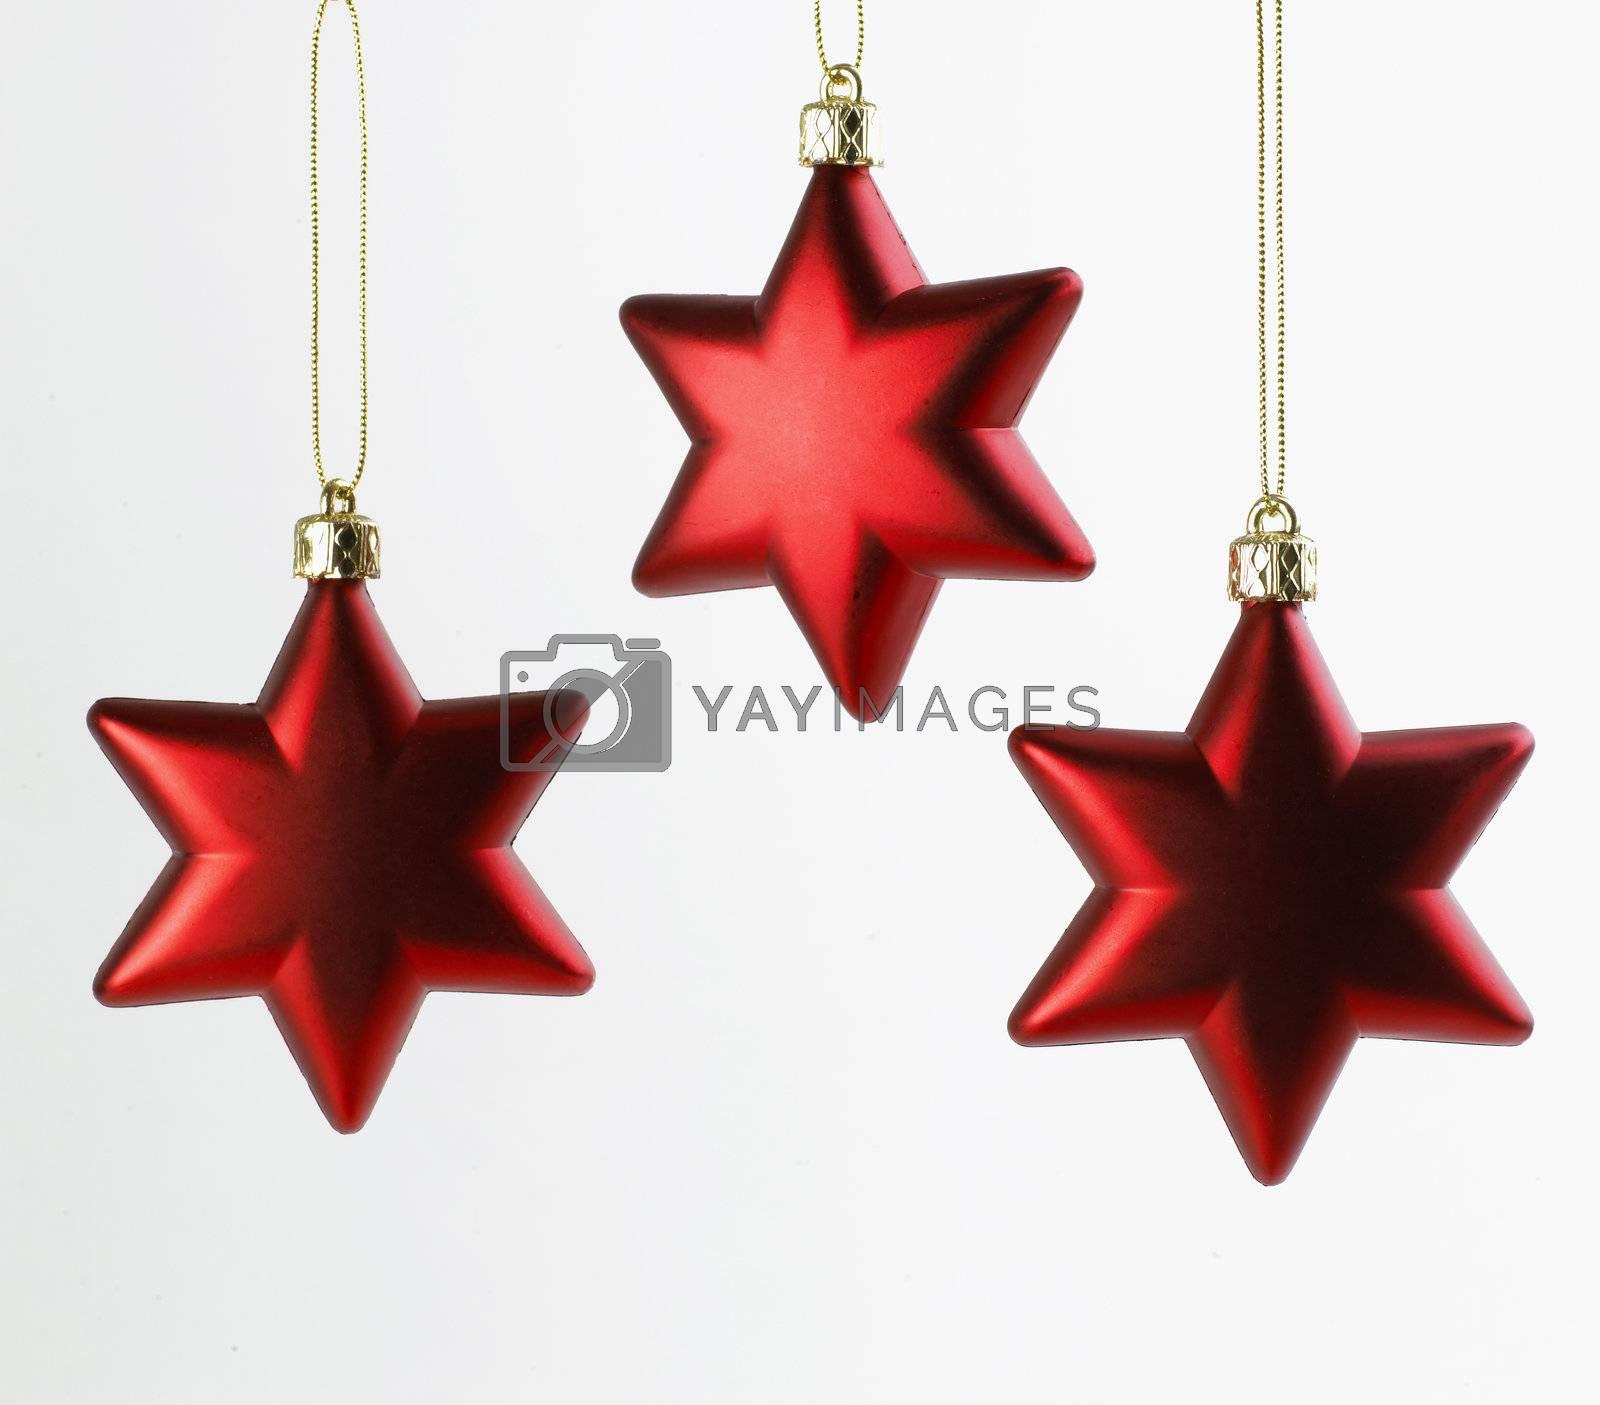 Royalty free image of Three Christmas Stars by studiovitra